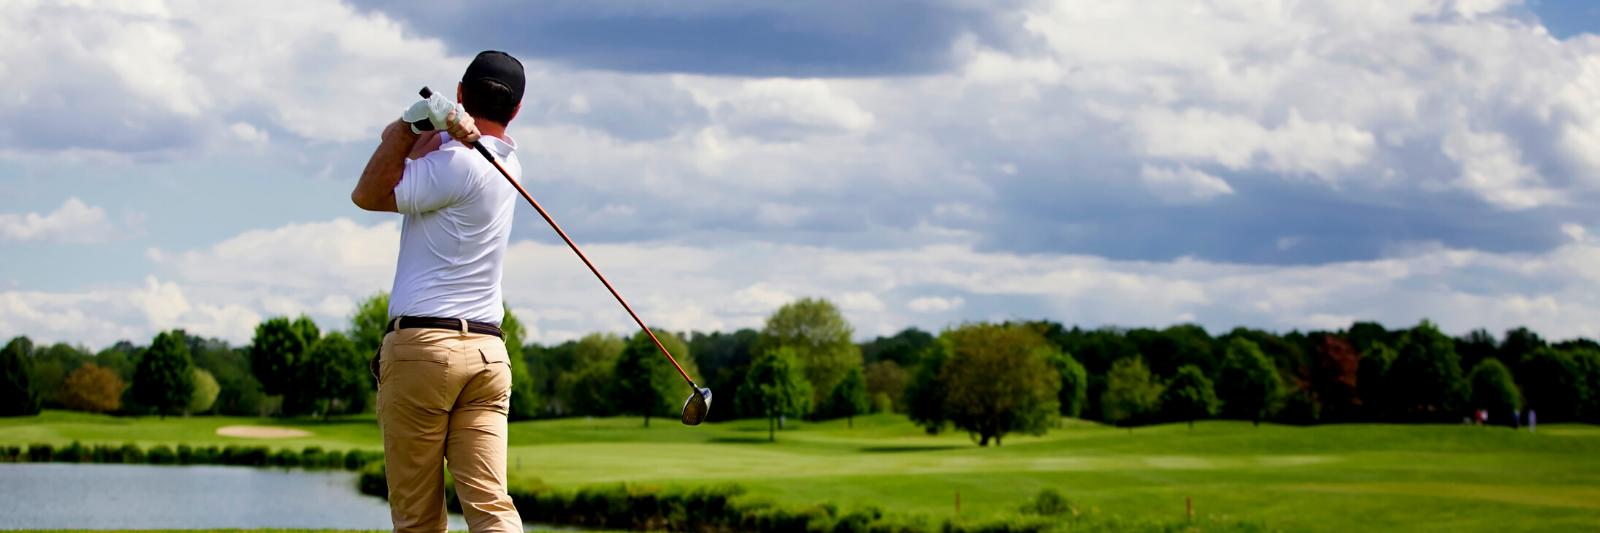 2020-Golf-Long.png